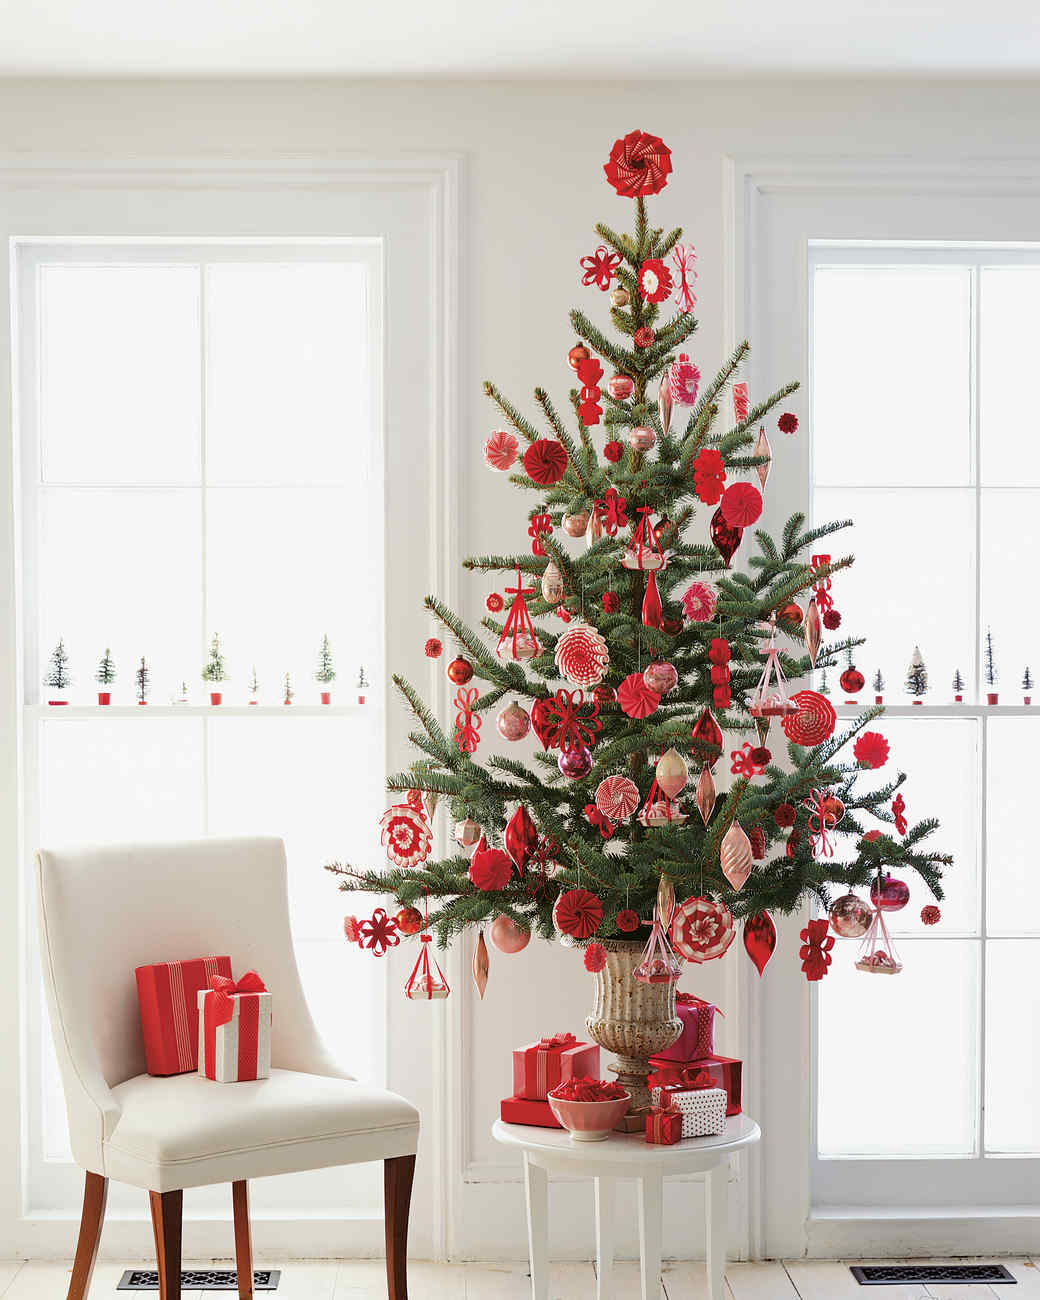 Owctcdi49 Orange White Christmas Tree Cardboard Decorating Ideas Finest Collection Wtsenates Info